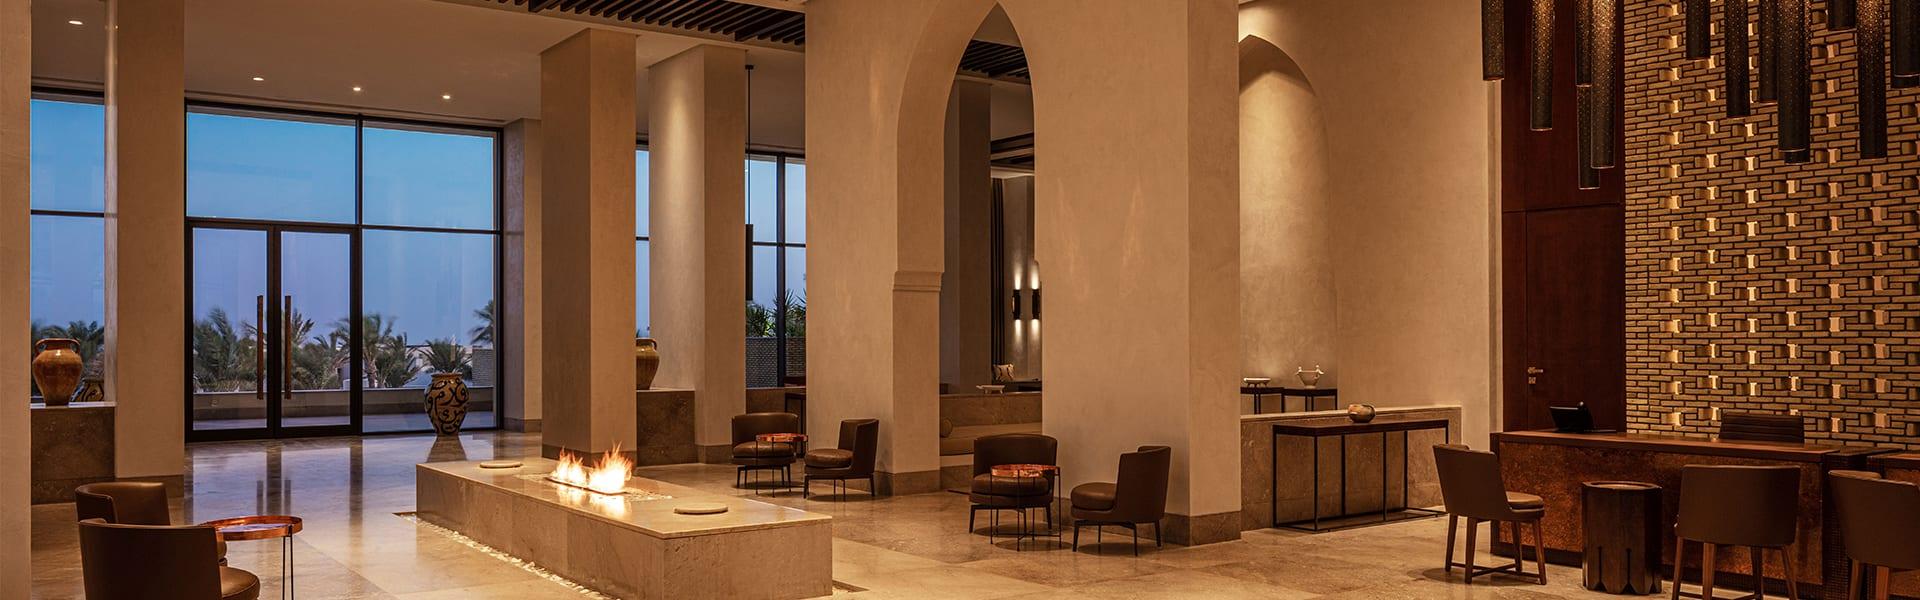 Cafes In Tunisia Anantara Tozeur Resort Lobby Lounge